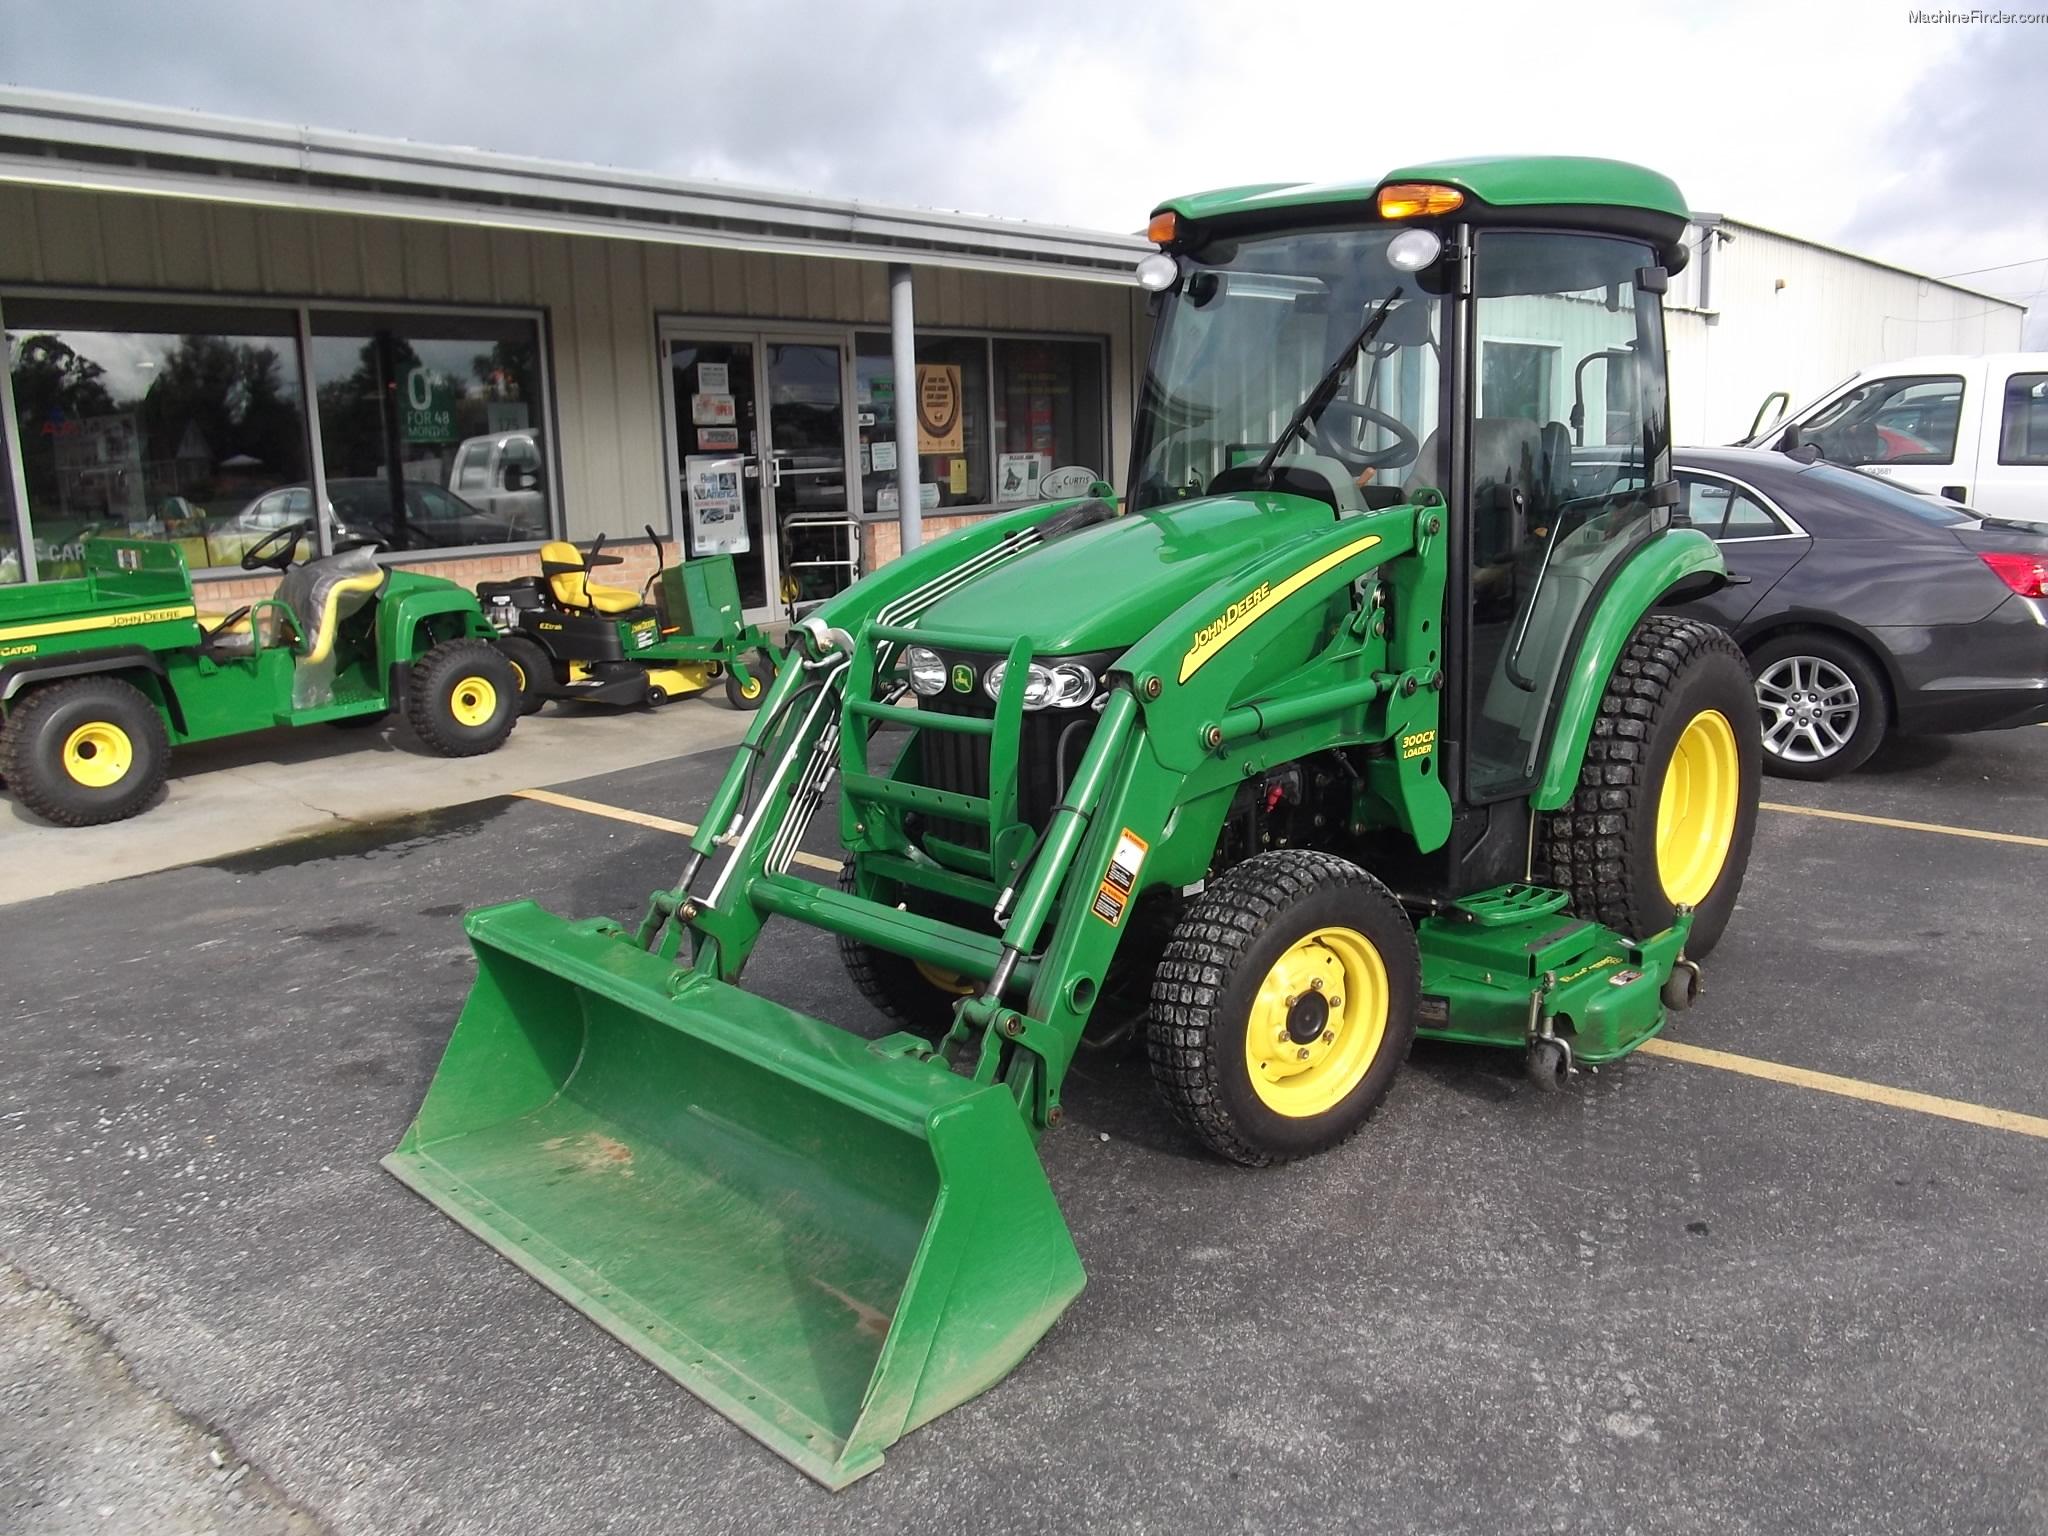 2009 John Deere 3720 Tractors - Compact (1-40hp.) - John ...